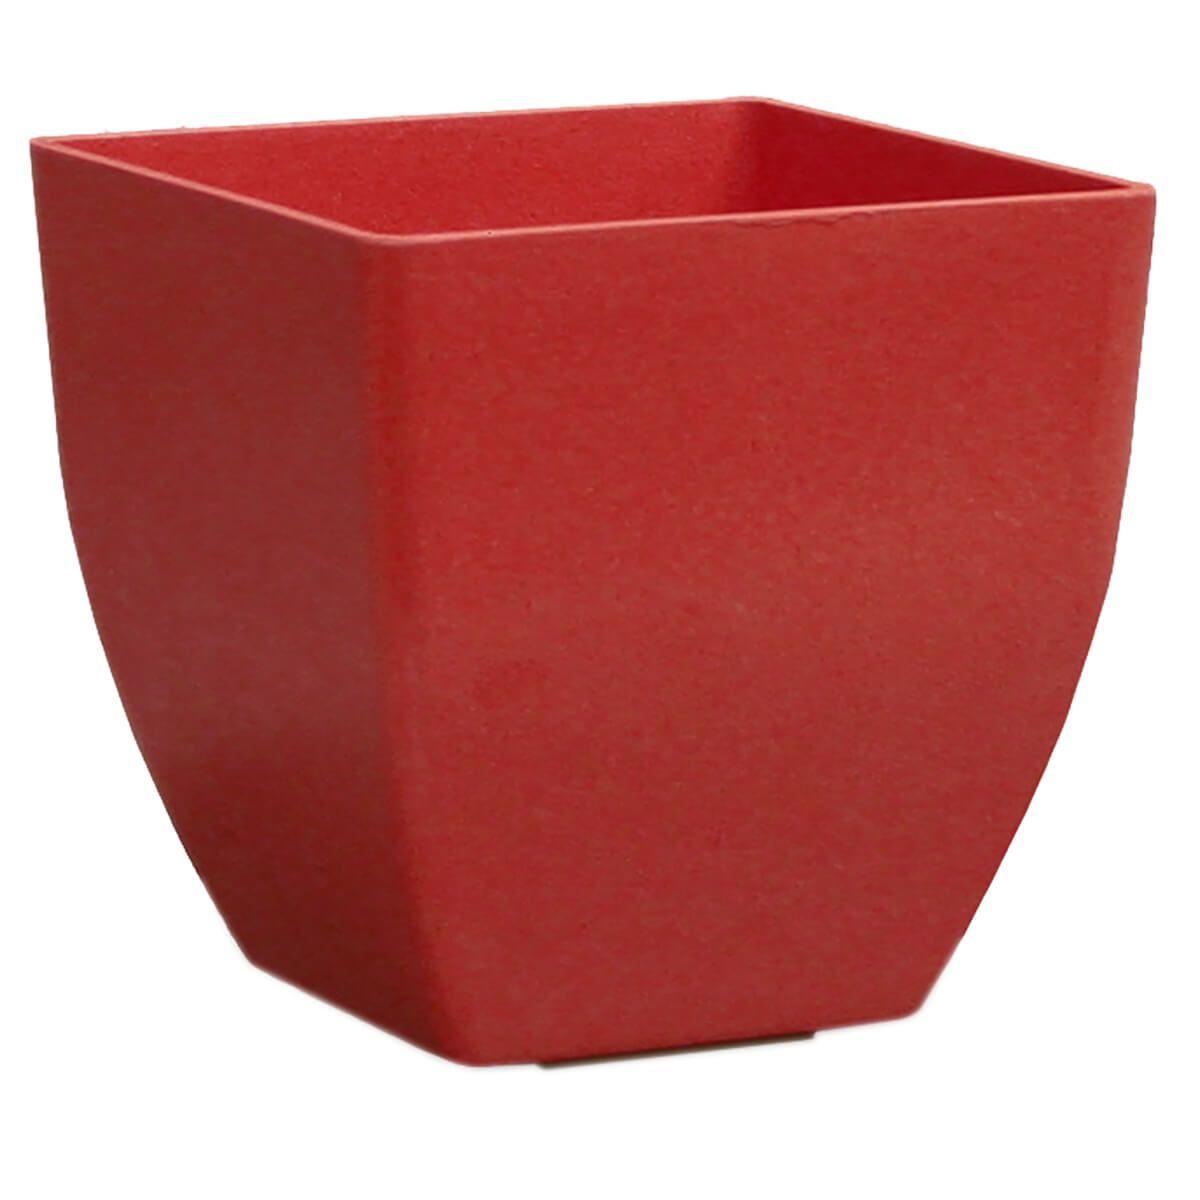 Vaso Siena 30 x 27 cm Vermelho Vasart